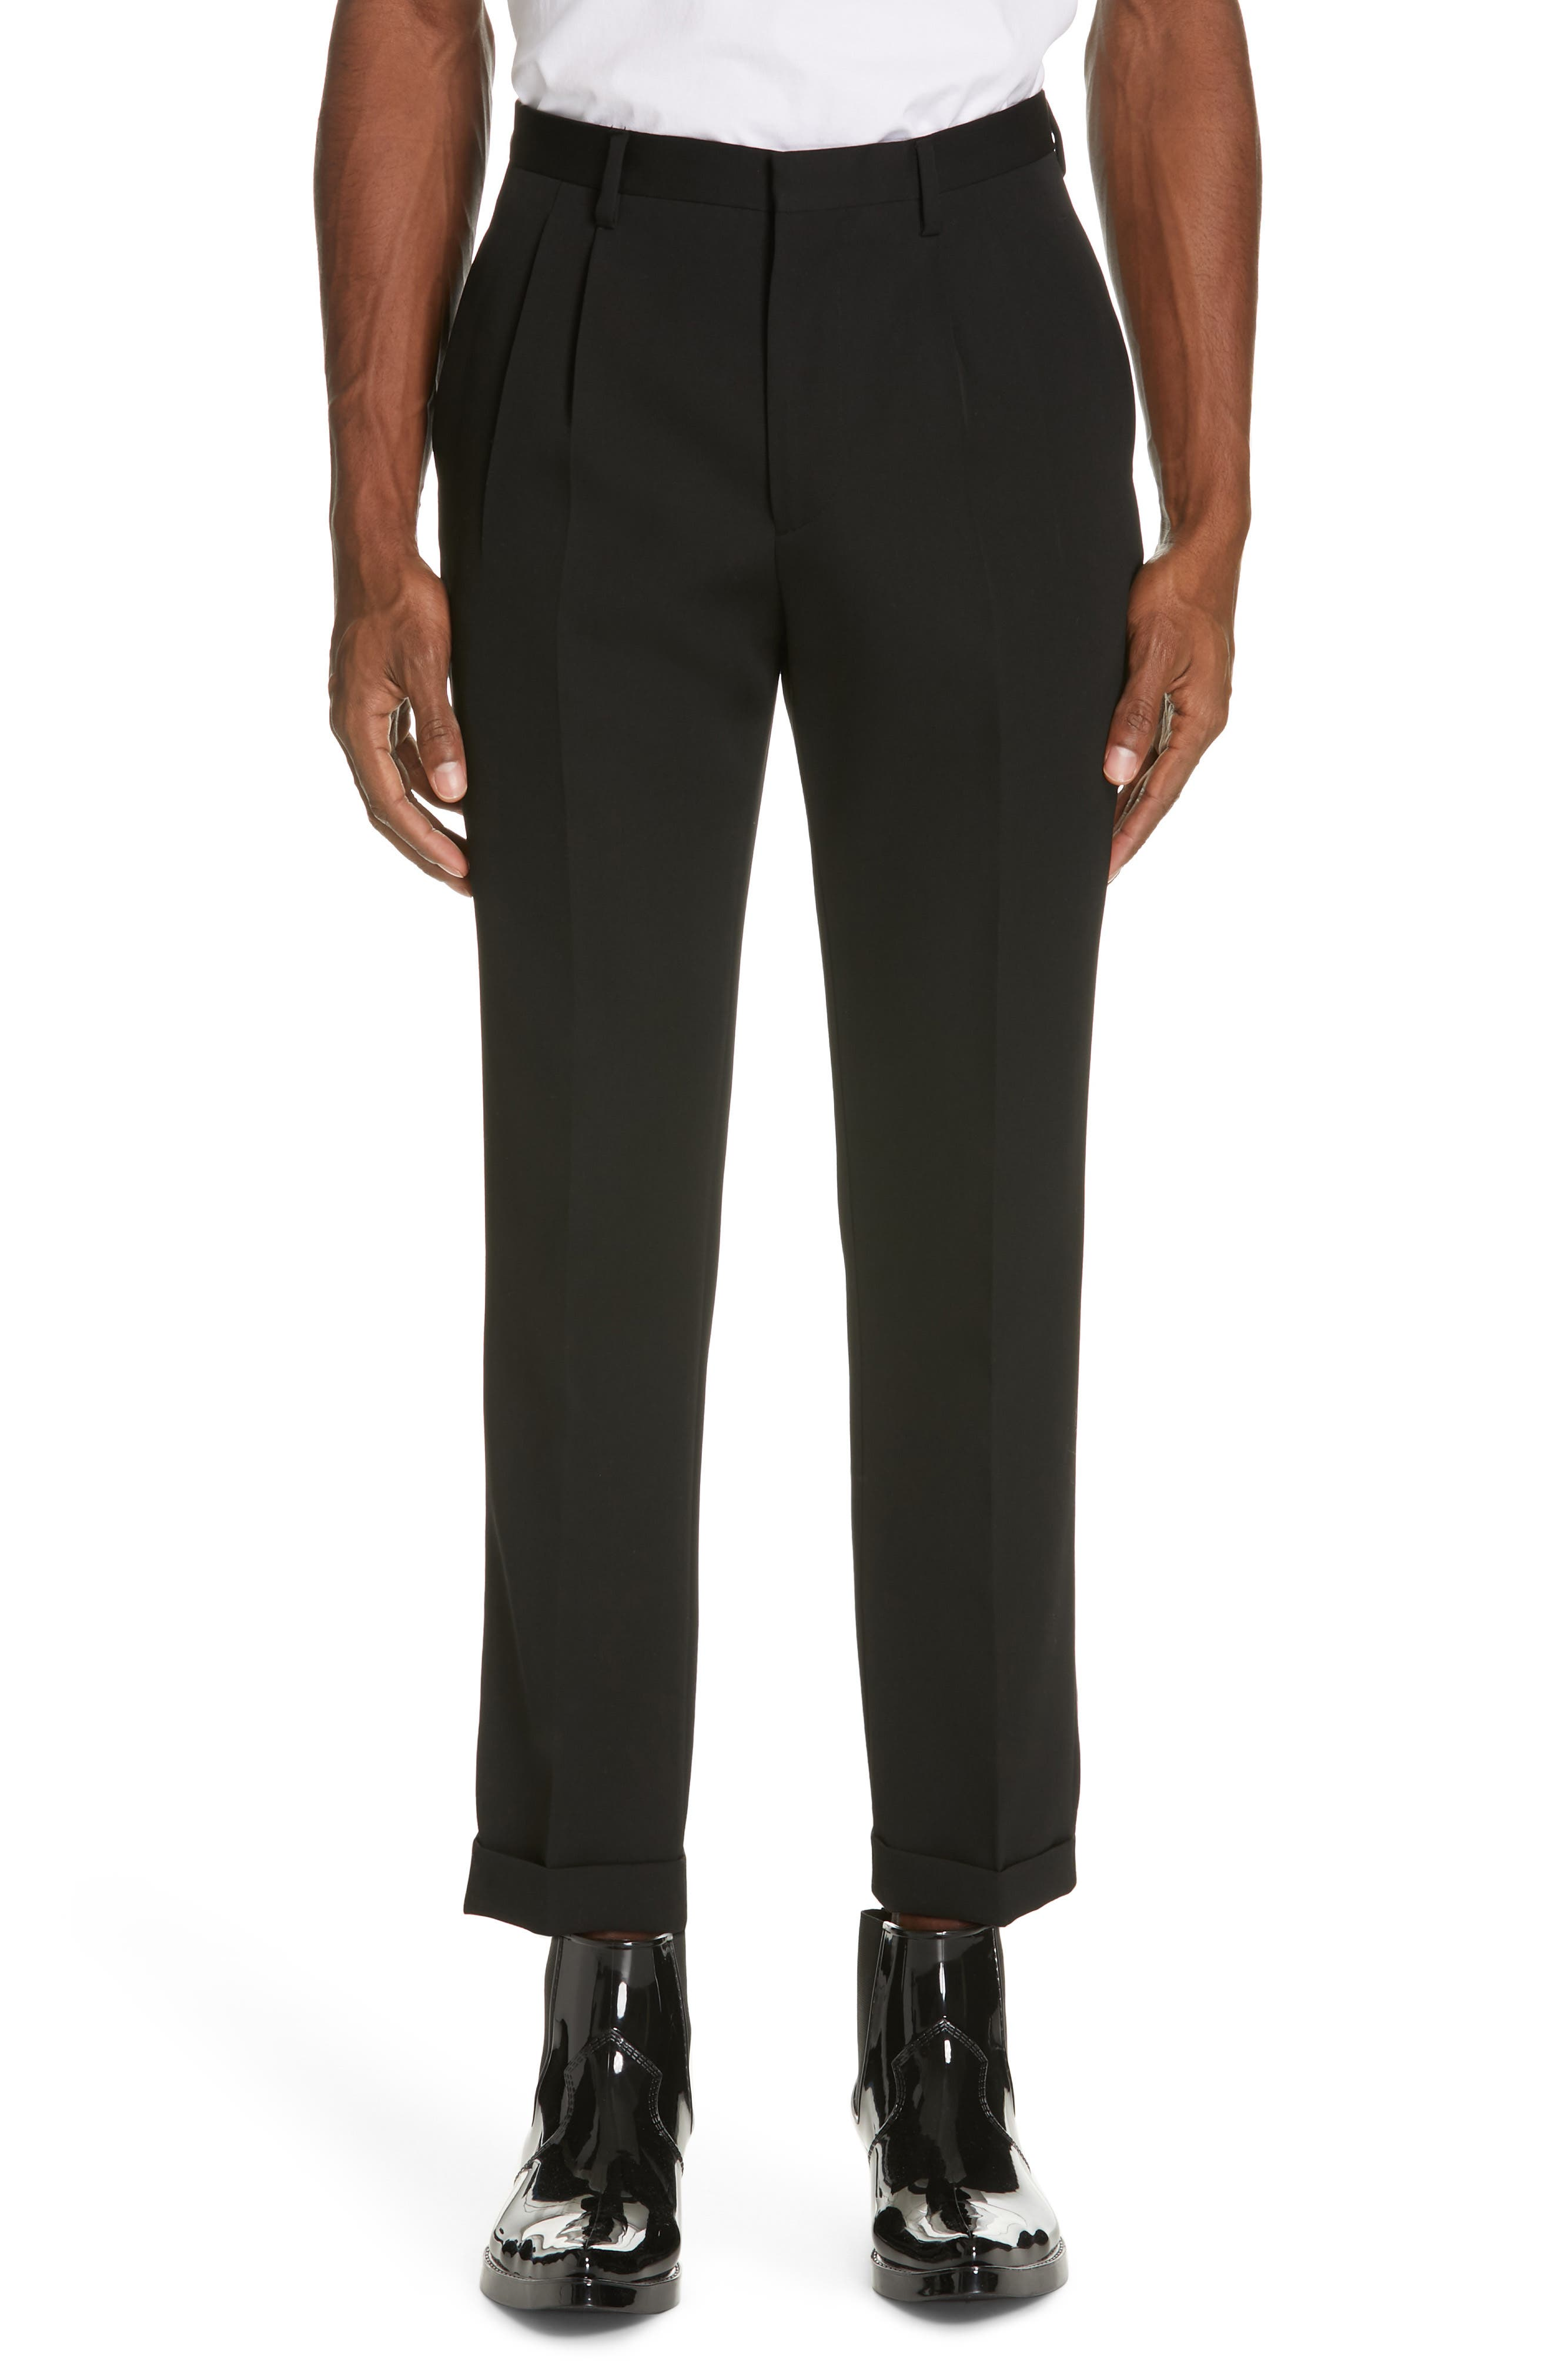 CALVIN KLEIN 205W39NYC, Pleated Gabardine Wool Trousers, Main thumbnail 1, color, BLACK